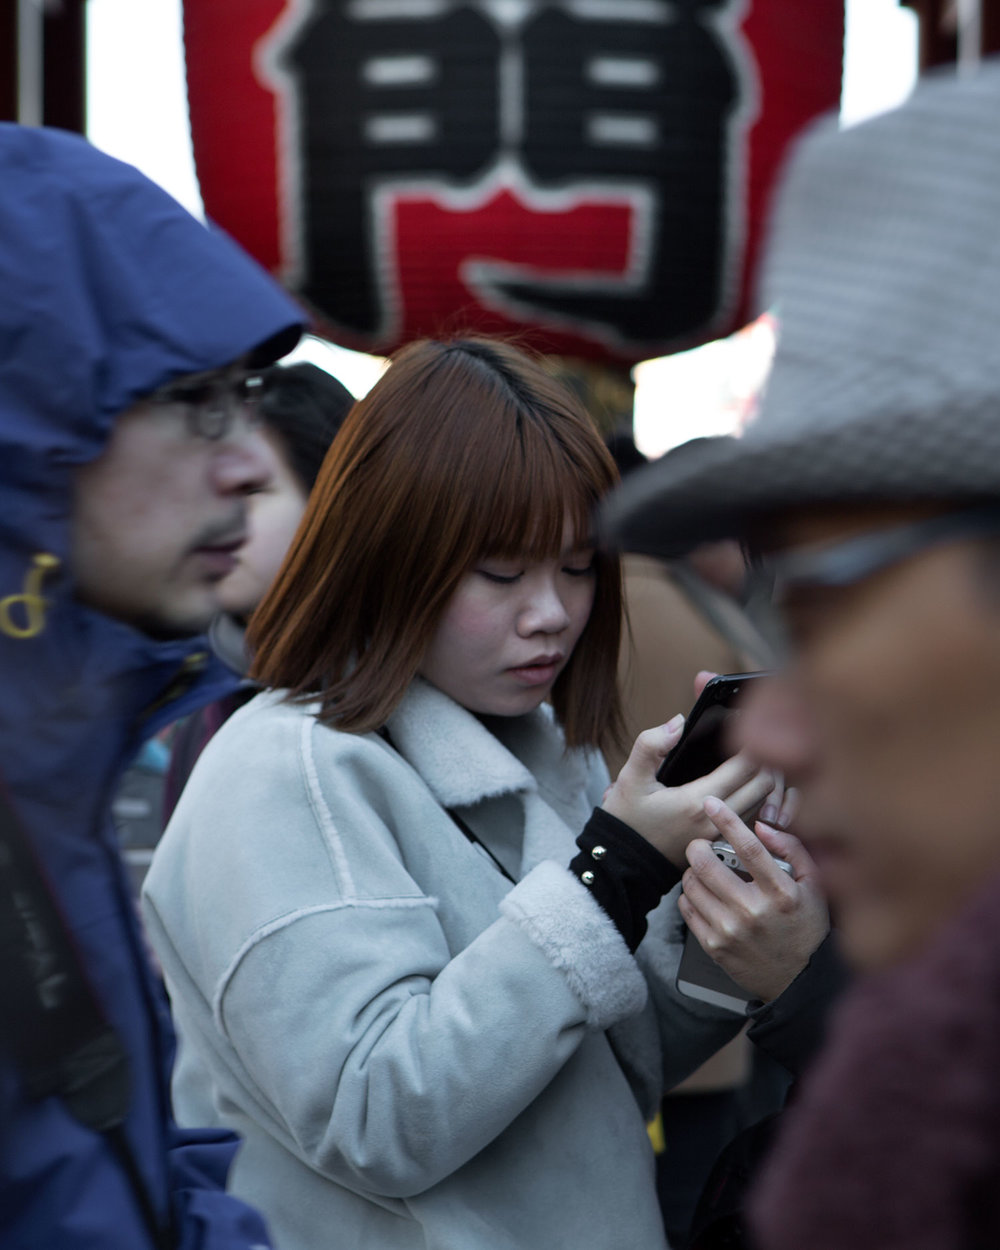 BEGGS_TOKYO_015.jpg